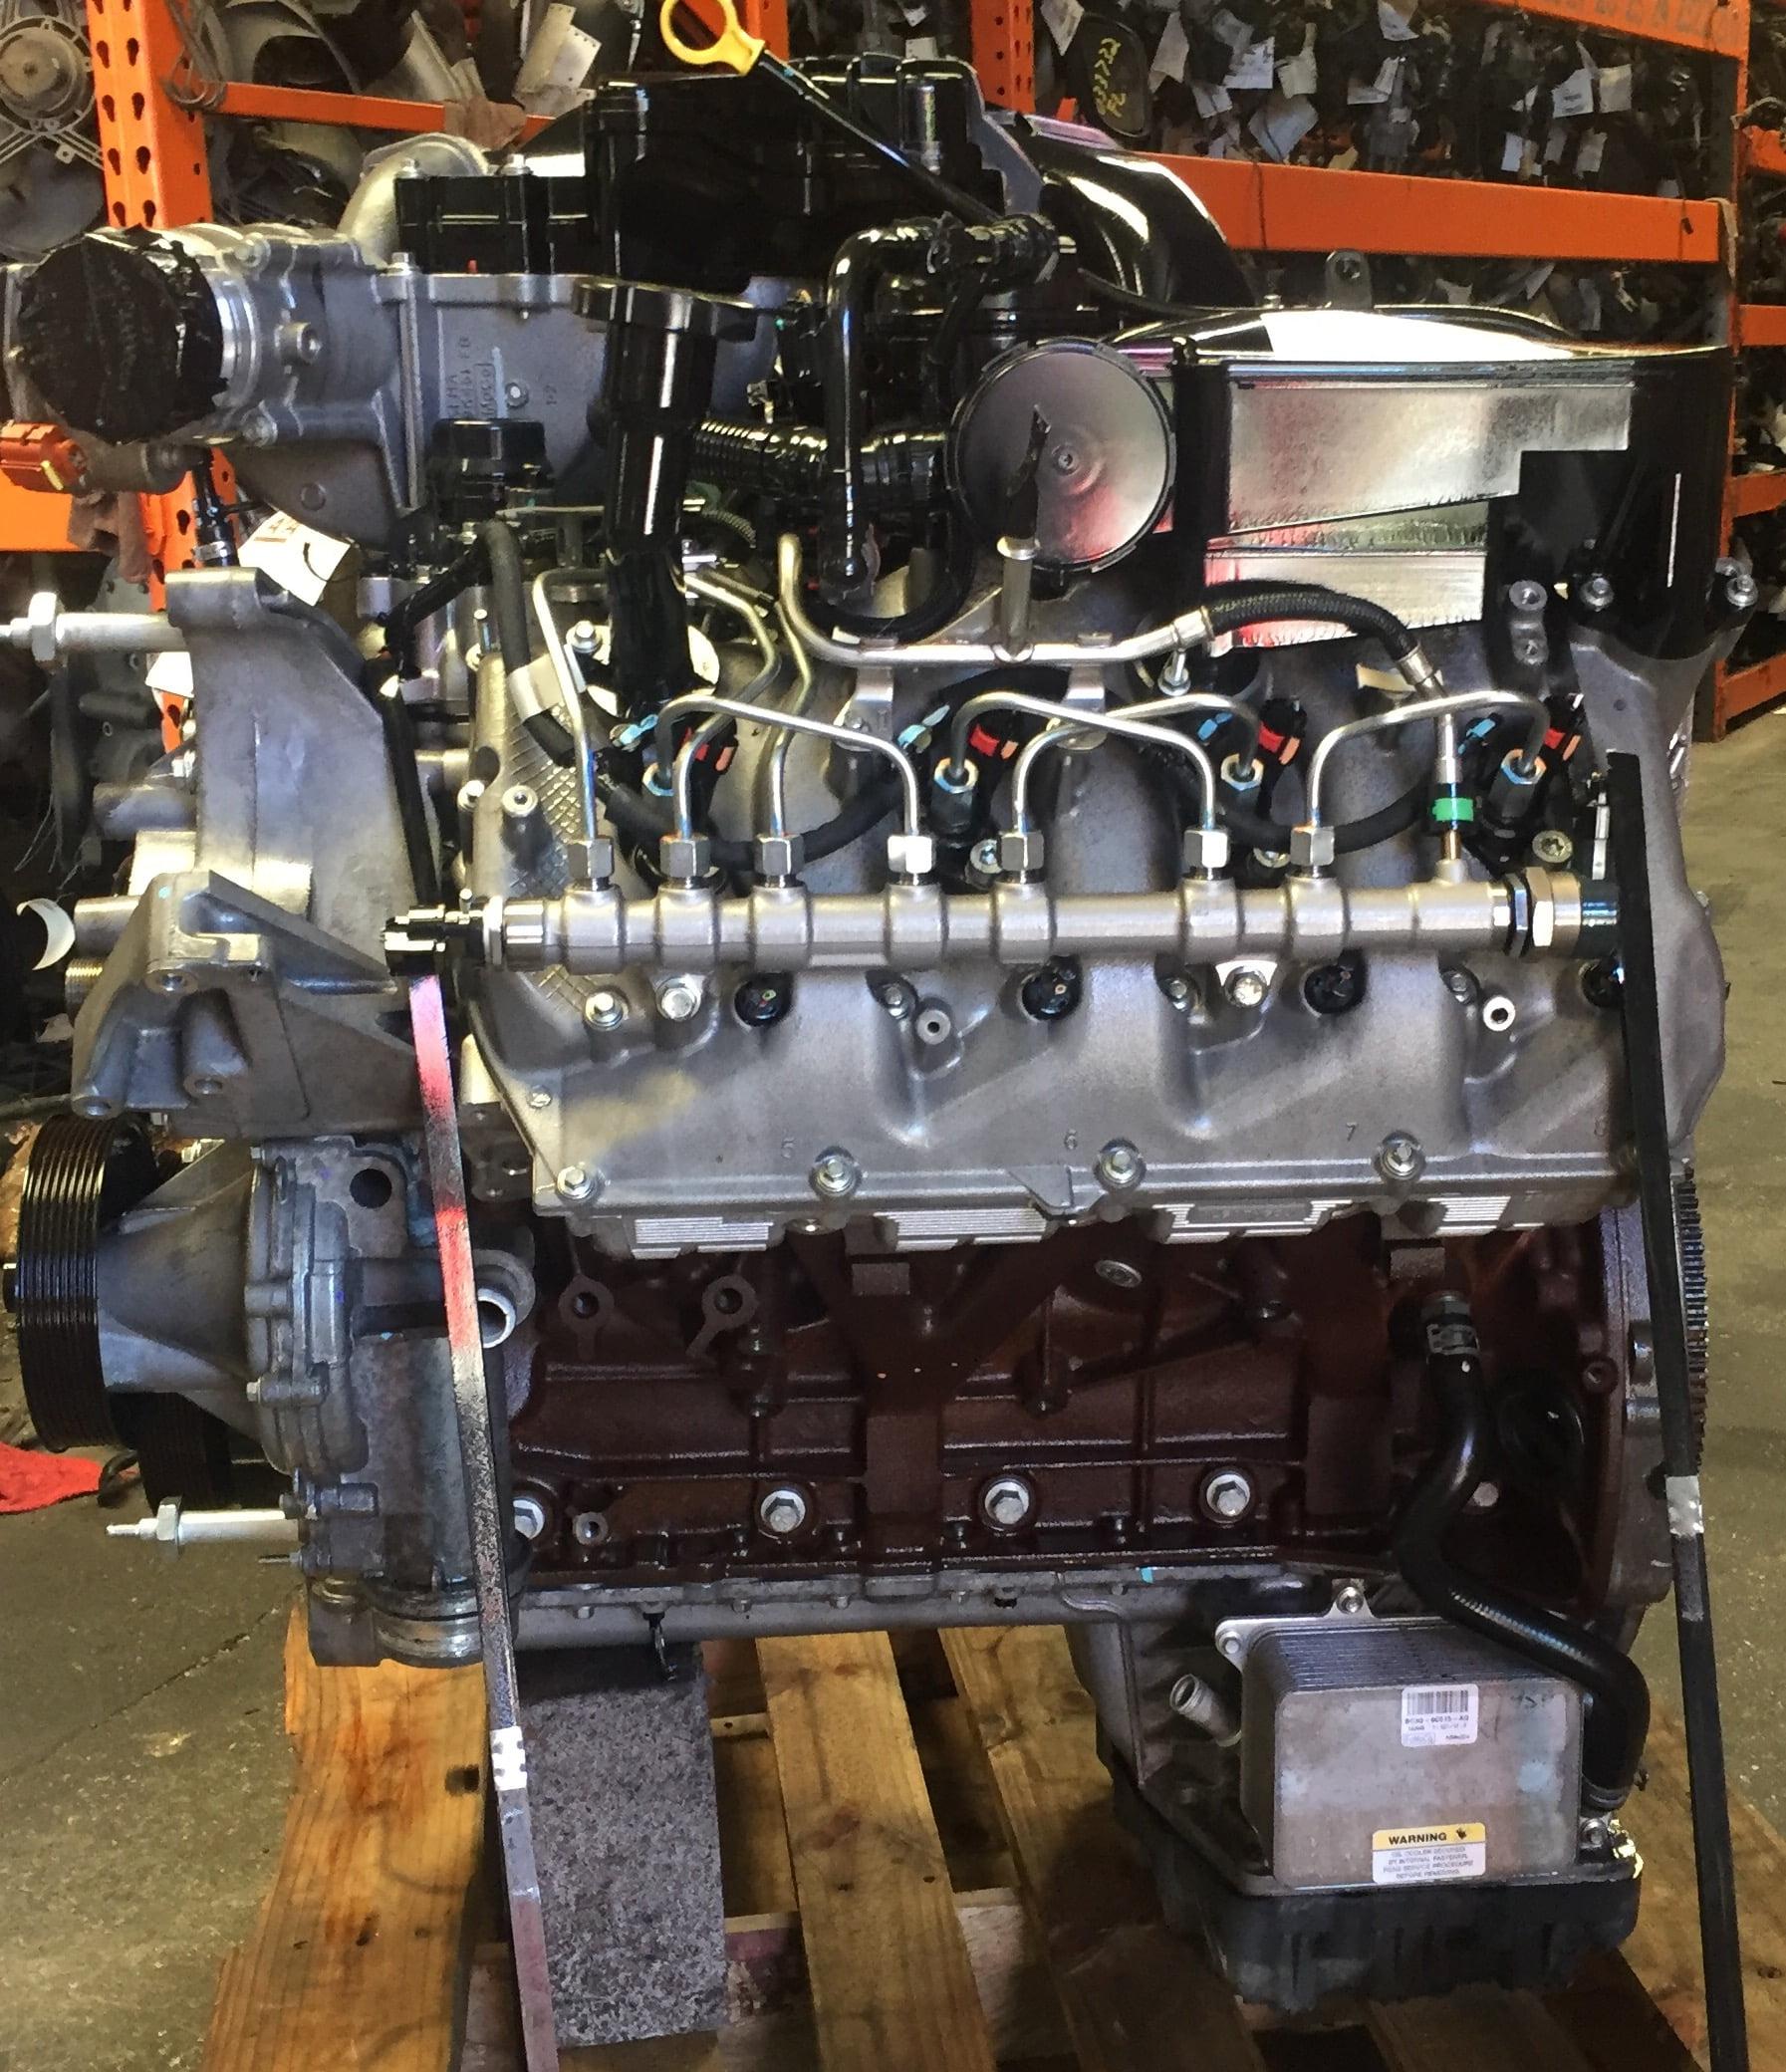 Pontiac 2 2 Engine Diagram Schematics Ford F250 F350 F450 F550 6 7l Diesel Engine 2011